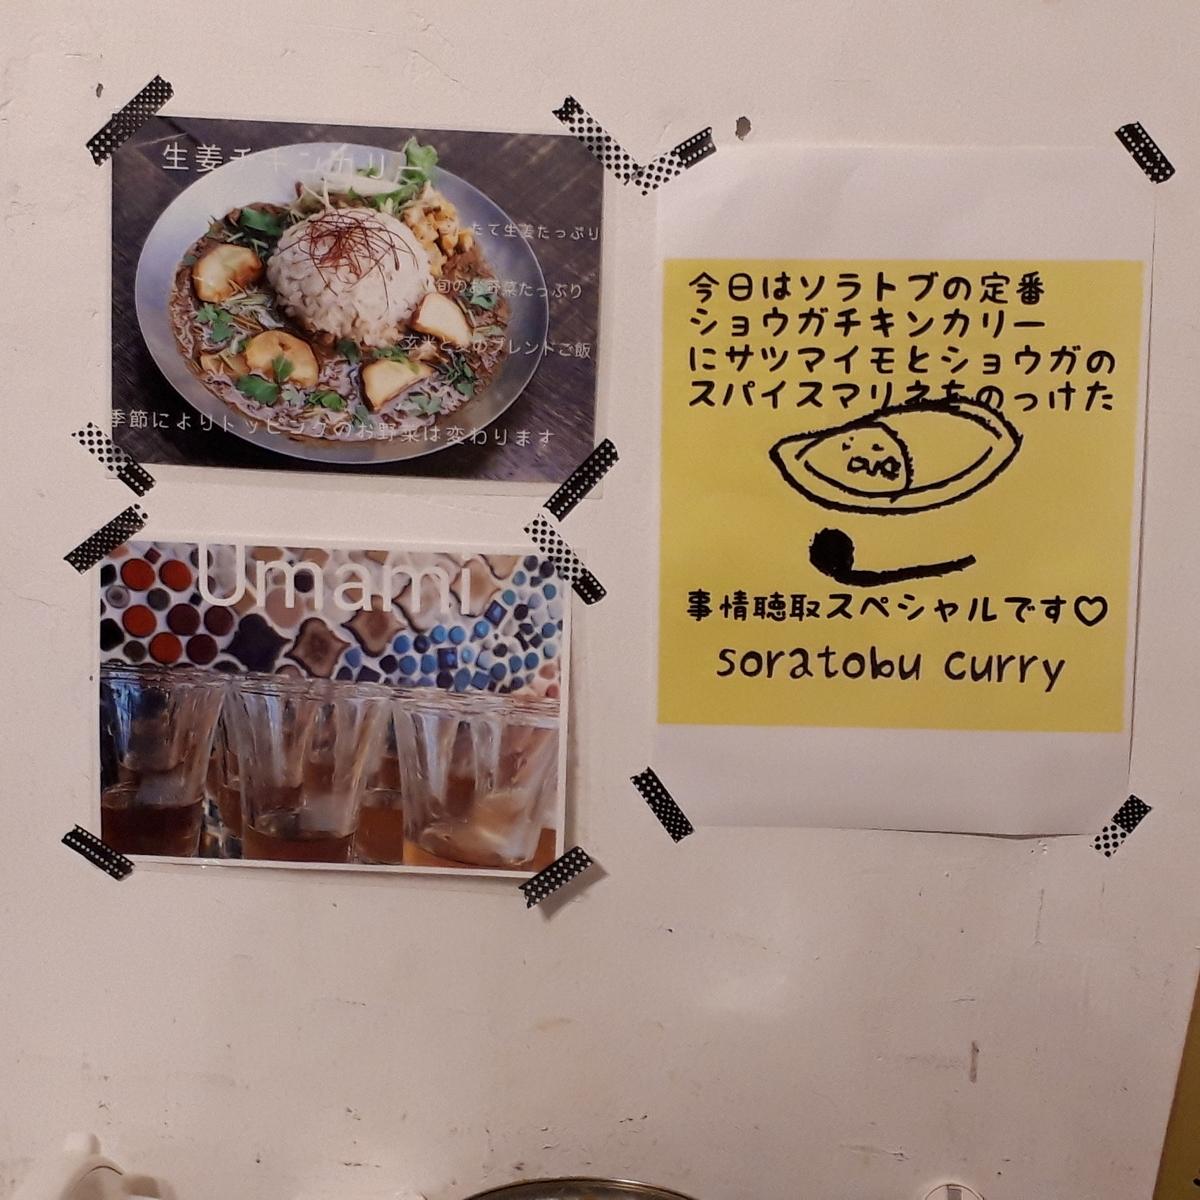 soratobu curry ショウガチキンカリーにサツマイモとショウガのスパイスマリネをのっけた